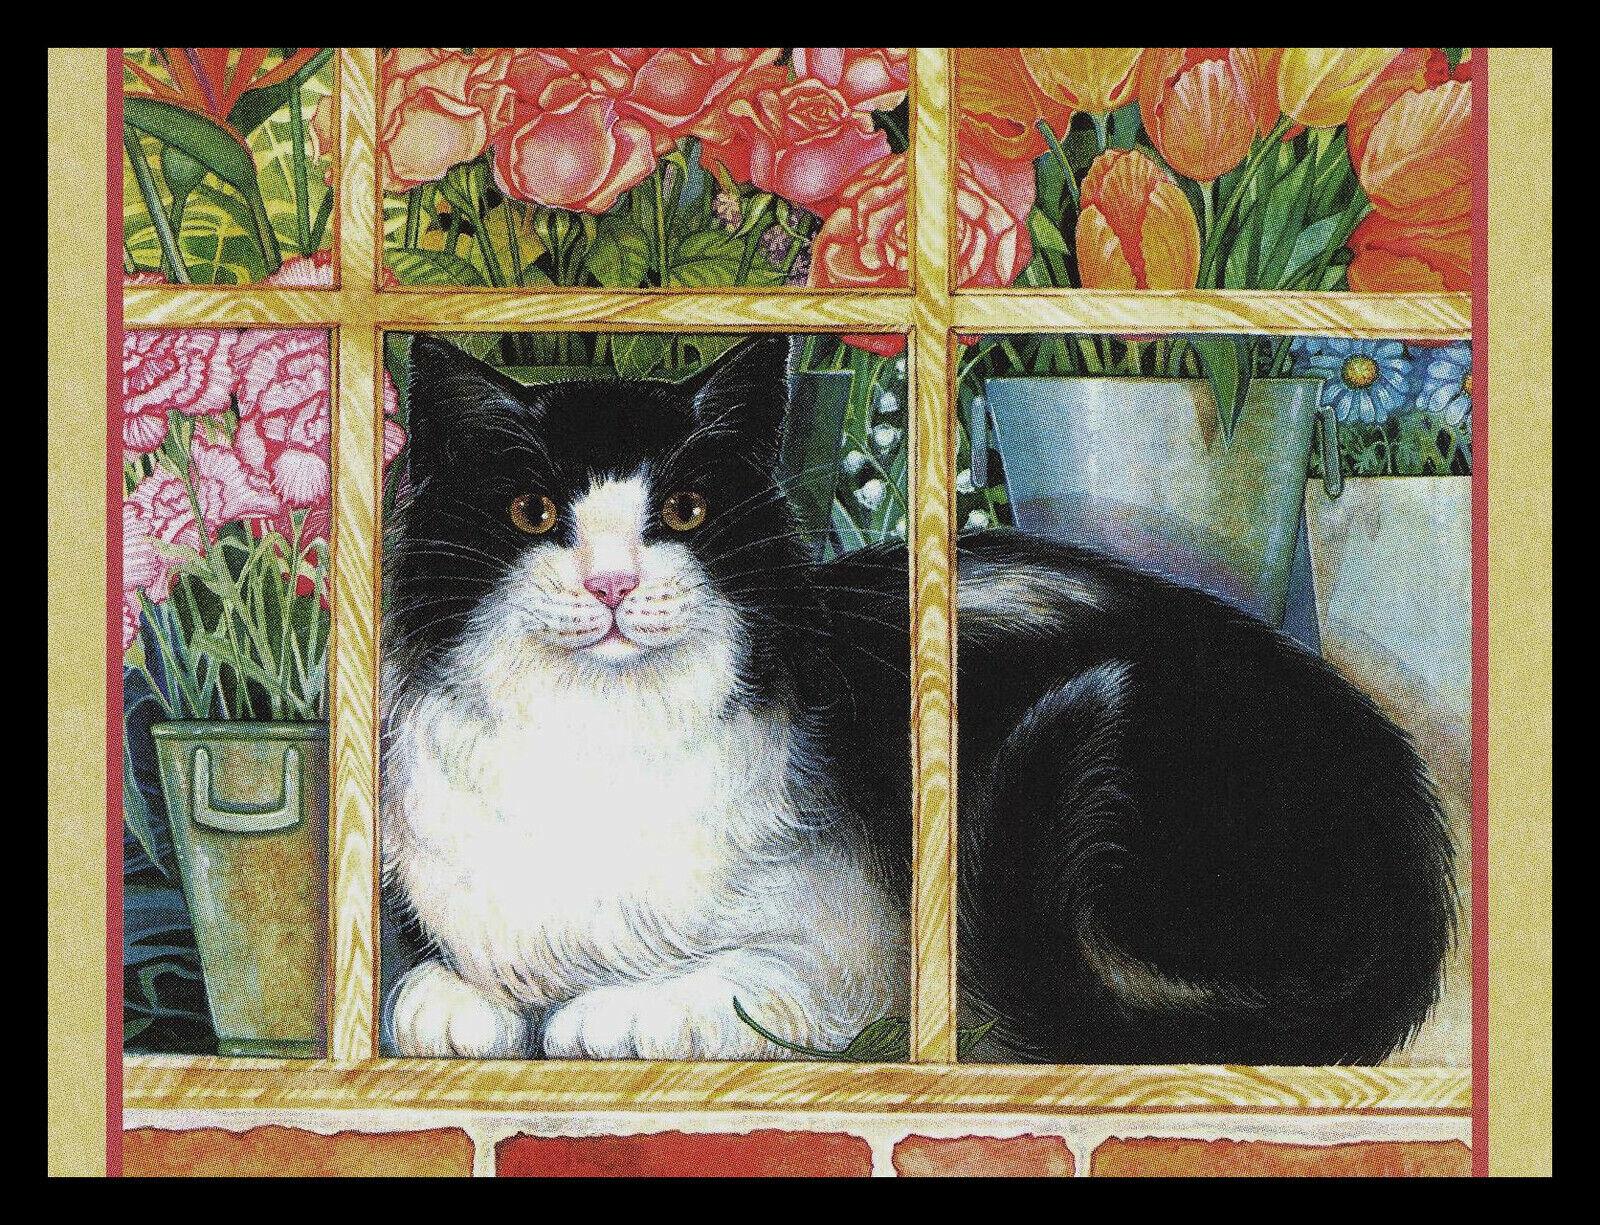 941-MSA Howard Robinson CAT KITTEN Blank Greeting Note Card NEW